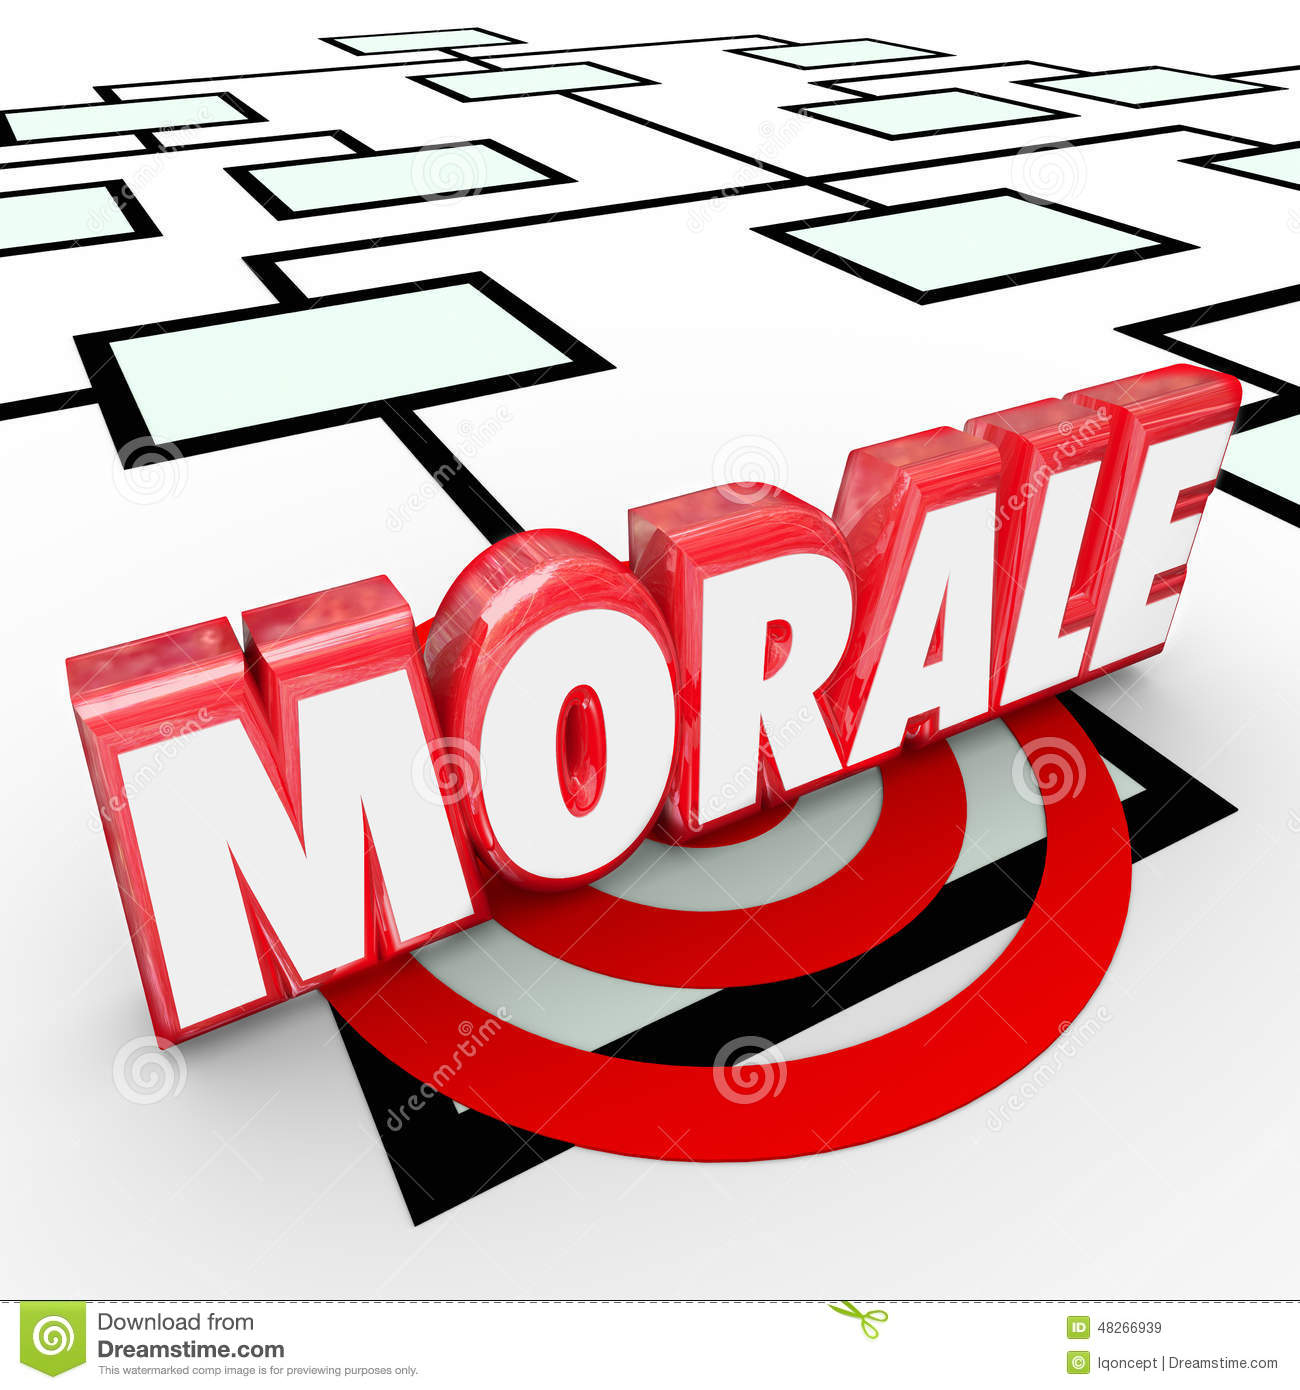 morale-d-word-organiztion-chart-improve-employee-workforce-atti-organization-to-illustrate-attitude-work-ethic-ambition-48266939.jpg